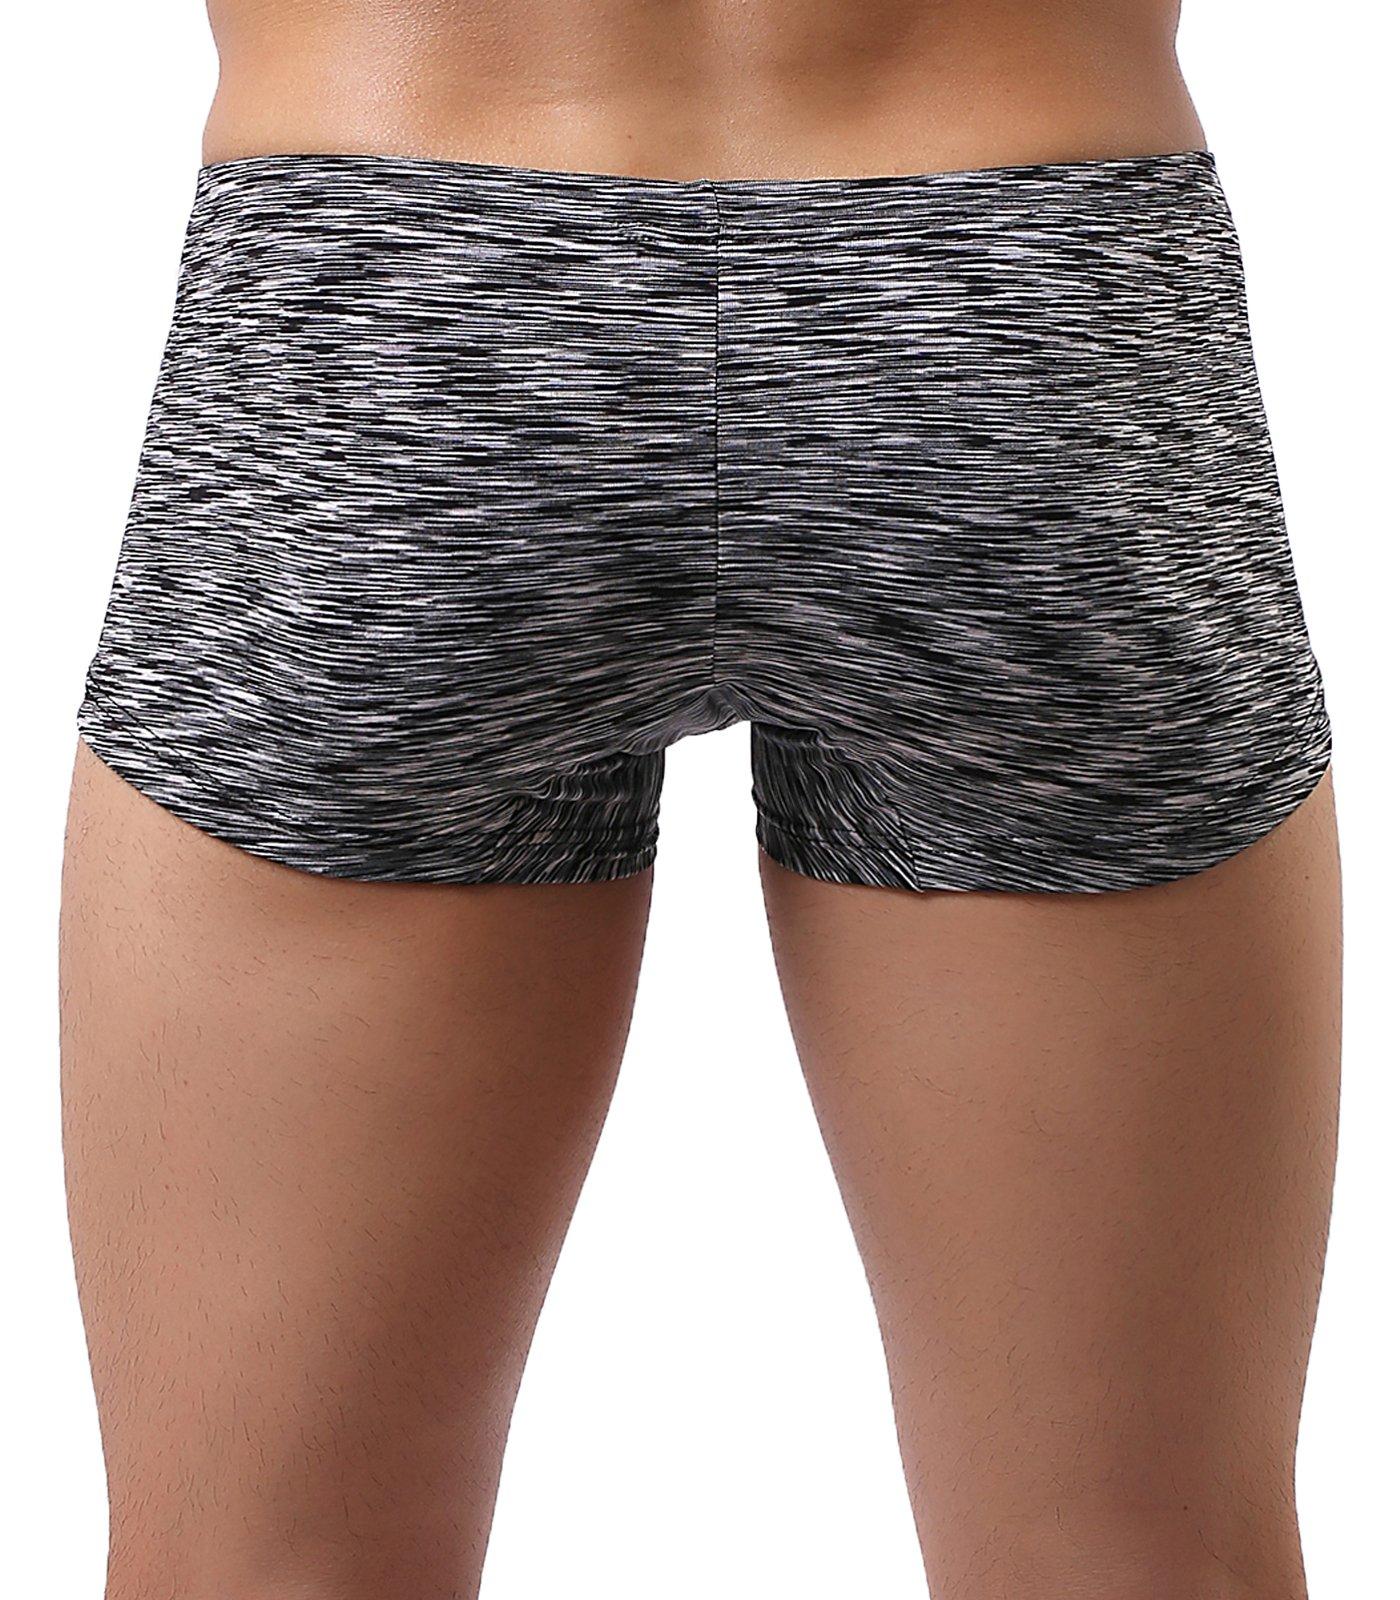 MAKEIIT Young Underwear X-Temp Boxers Guys Underwear Fitted Cool Boxer Briefs Men by MAKEIIT (Image #4)